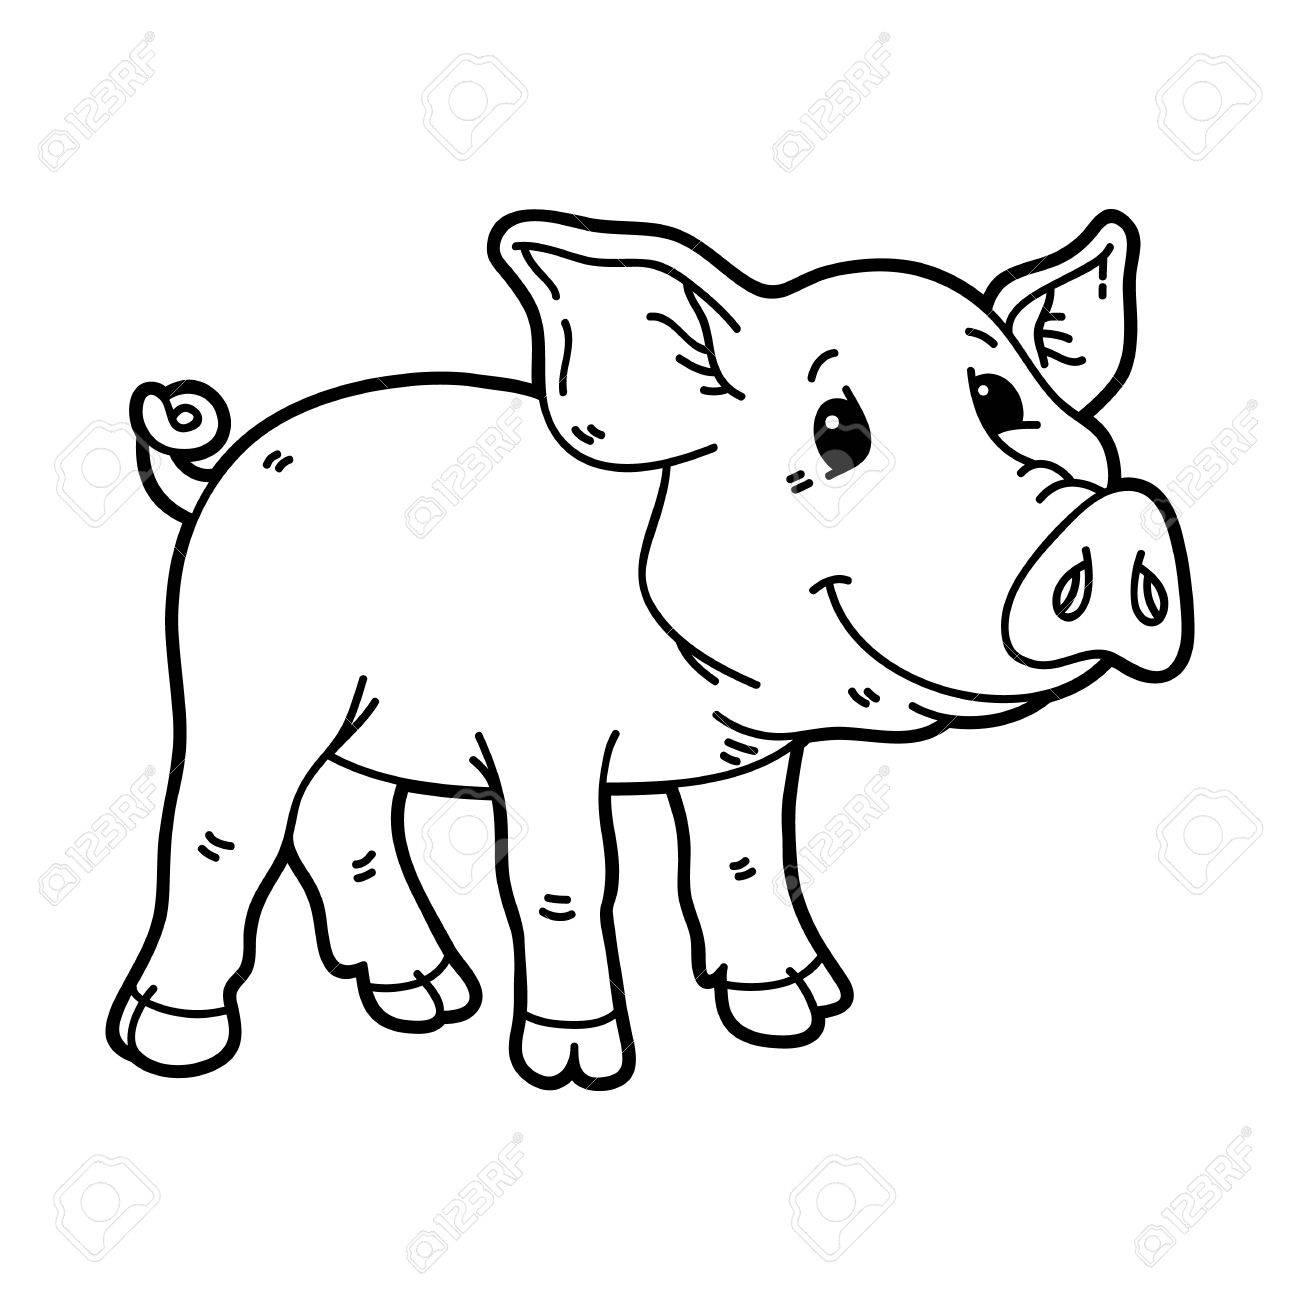 1300x1300 Cute Piggy. Vector Illustration Of Outline Cartoon Little Pig